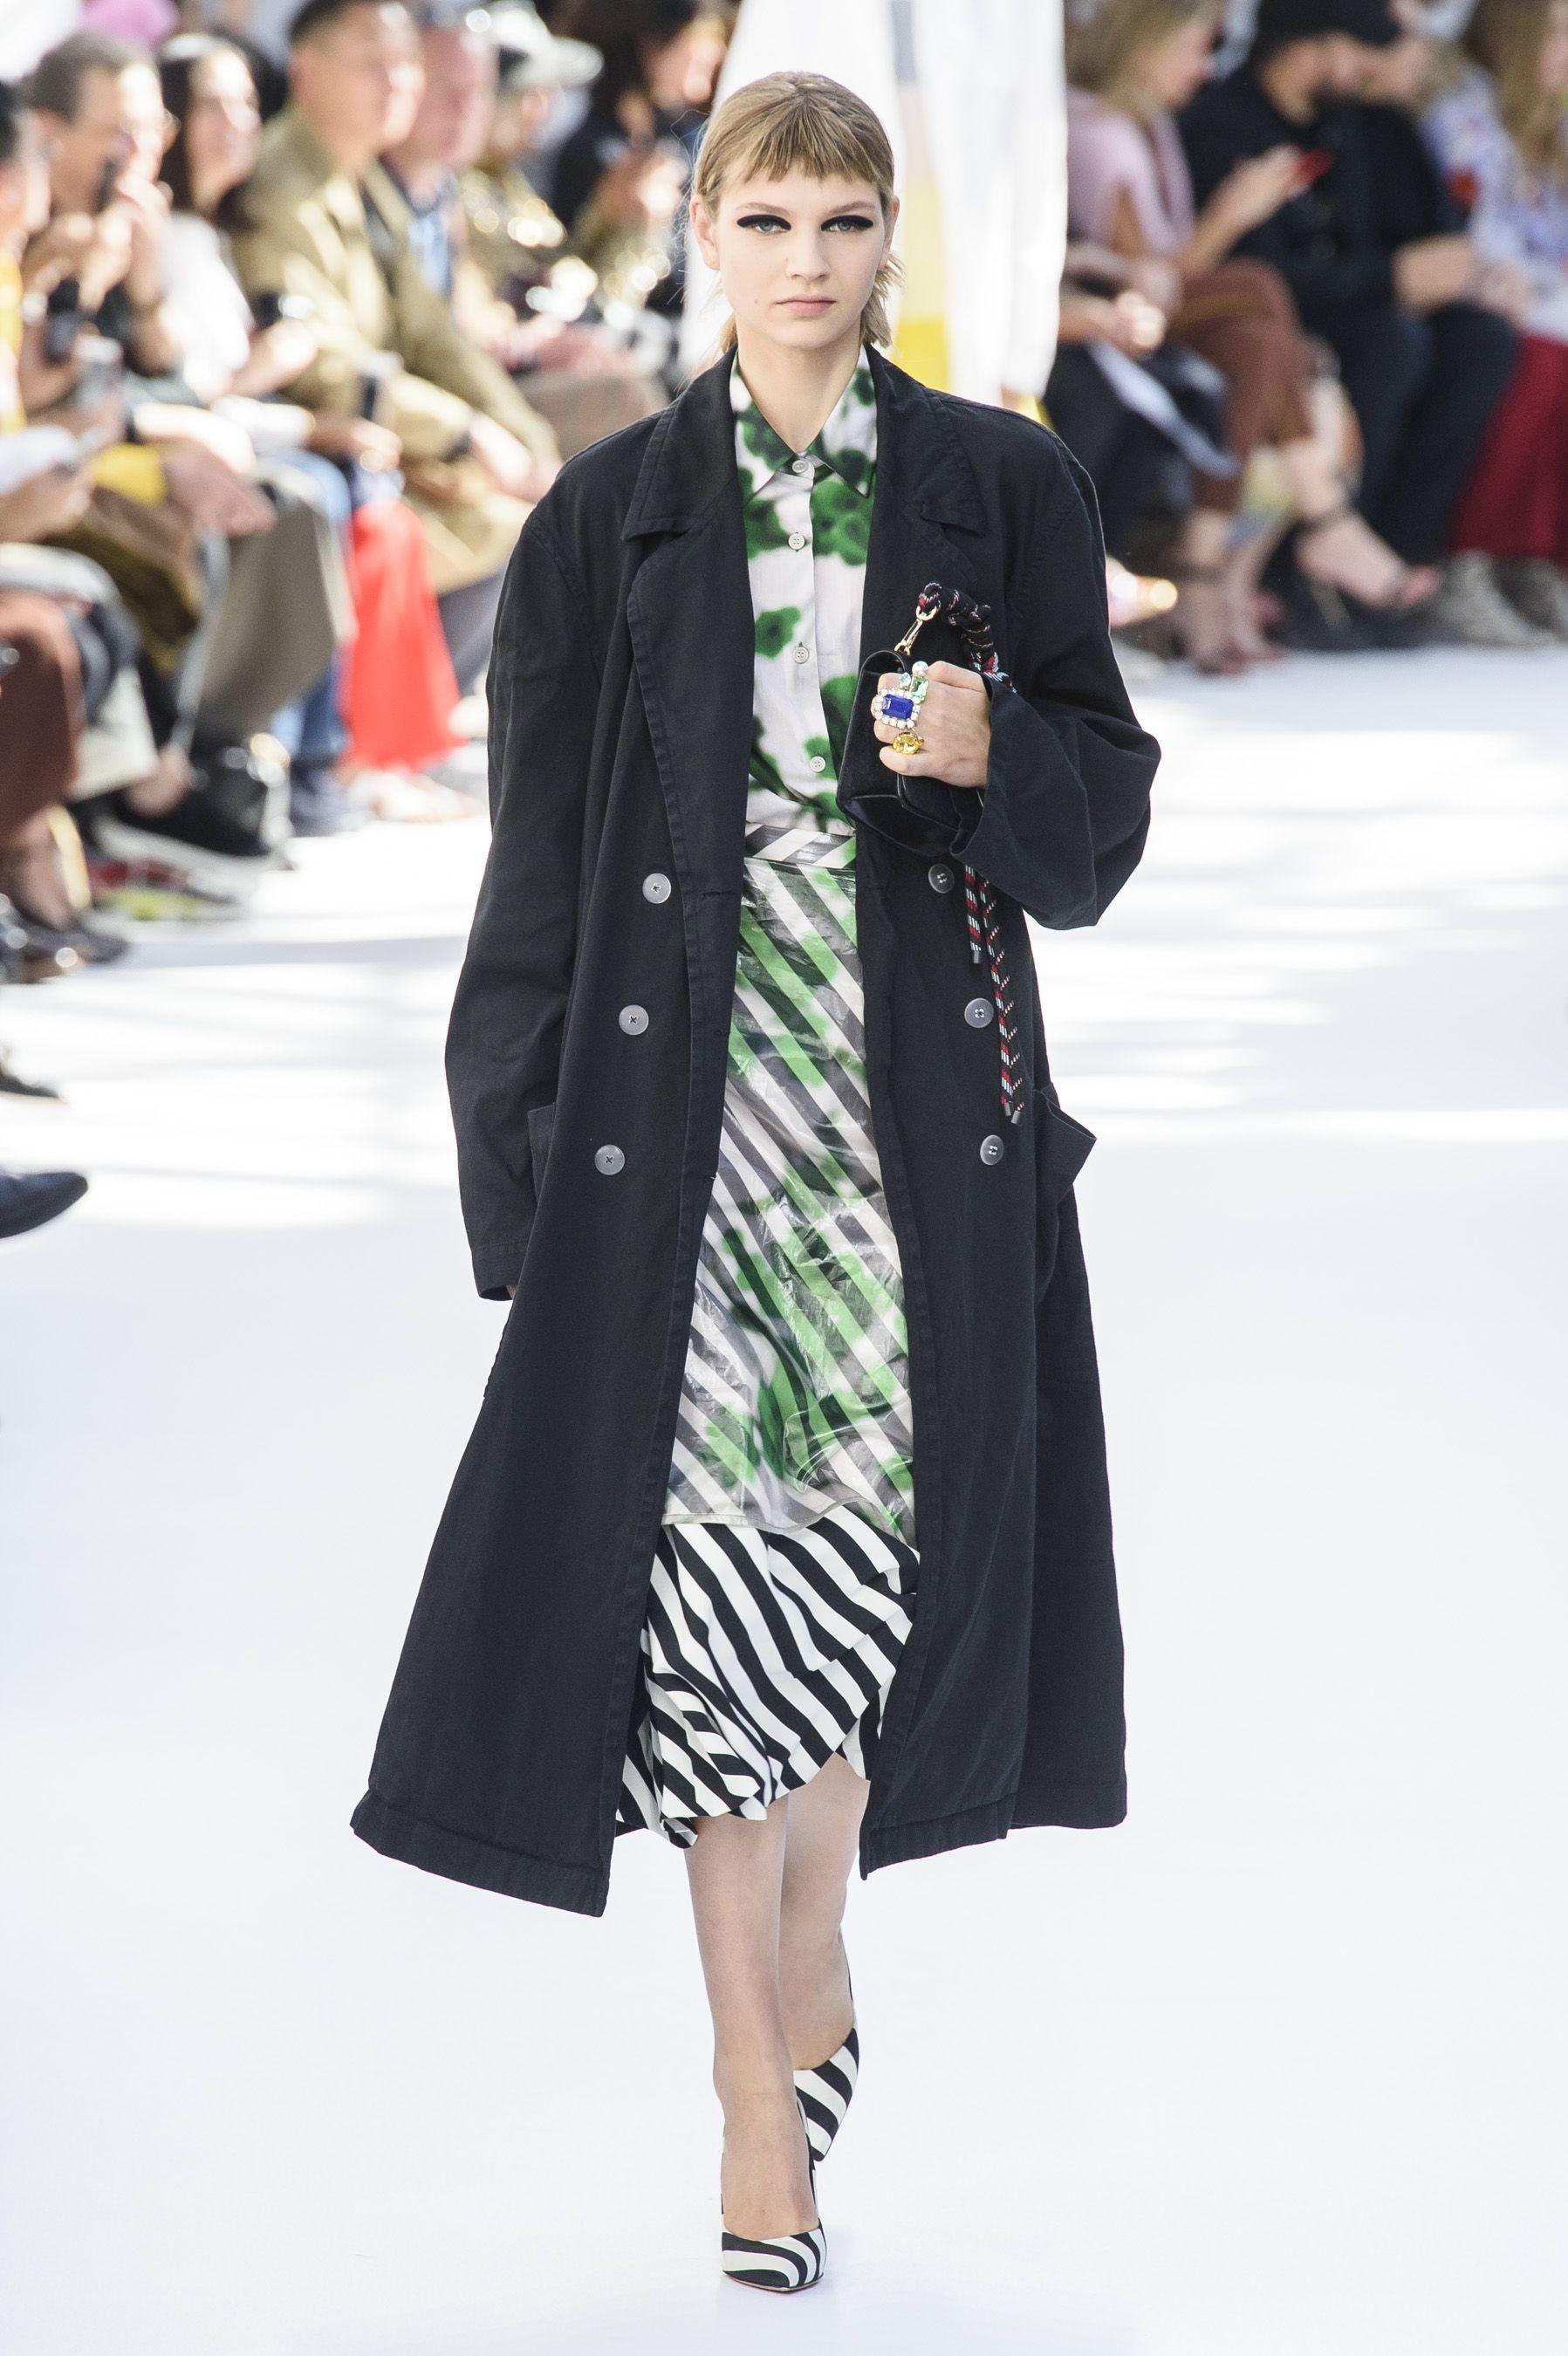 e37909f2b7 61 Best Looks from Dries Van Noten Spring 2019 - Dries Van Noten Runway  Looks Spring 2019 Paris Fashion Week